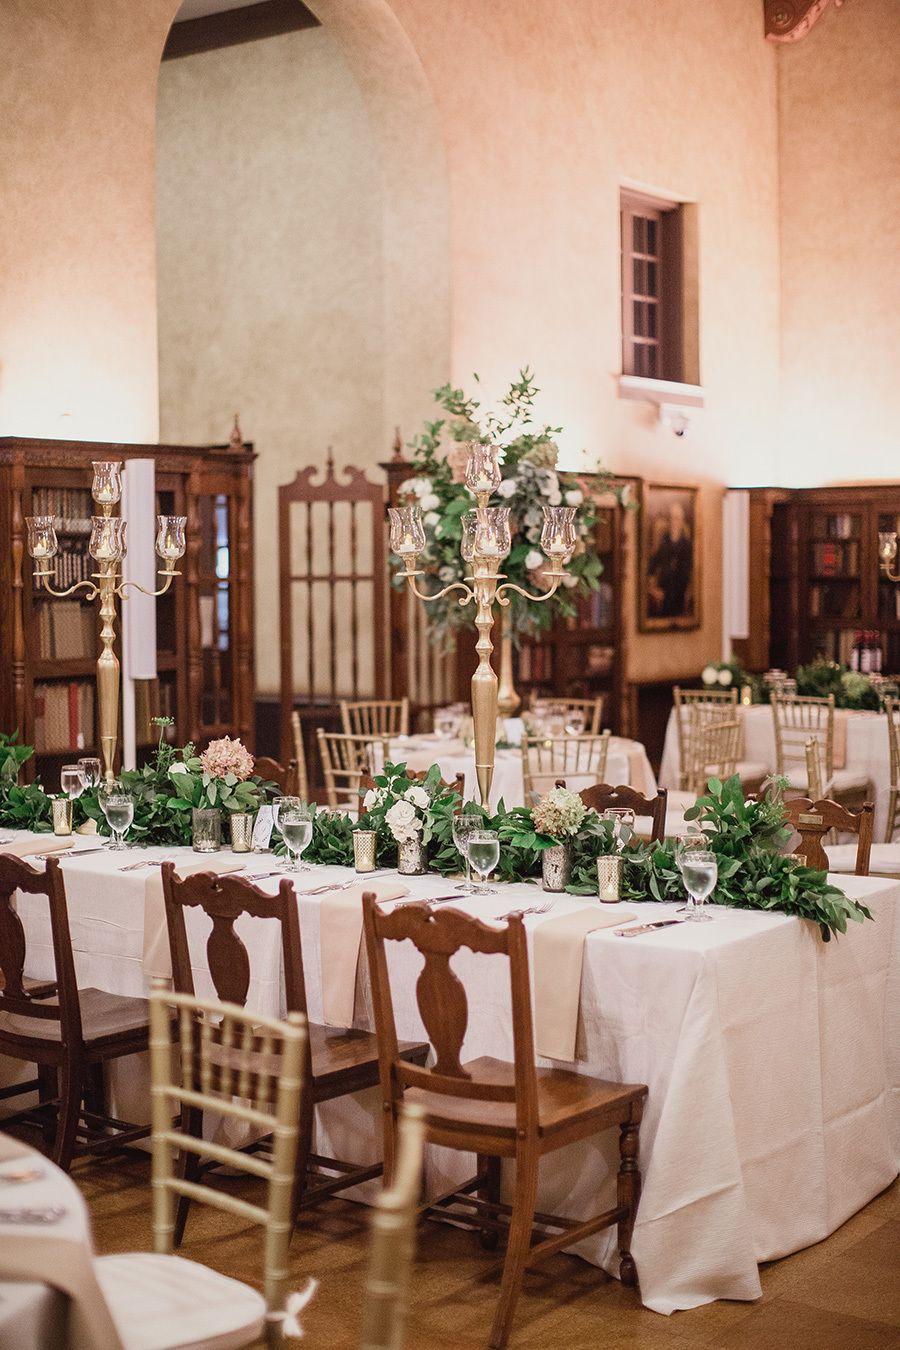 Rustic Elegant Library Themed Wedding | Rustic elegance ...